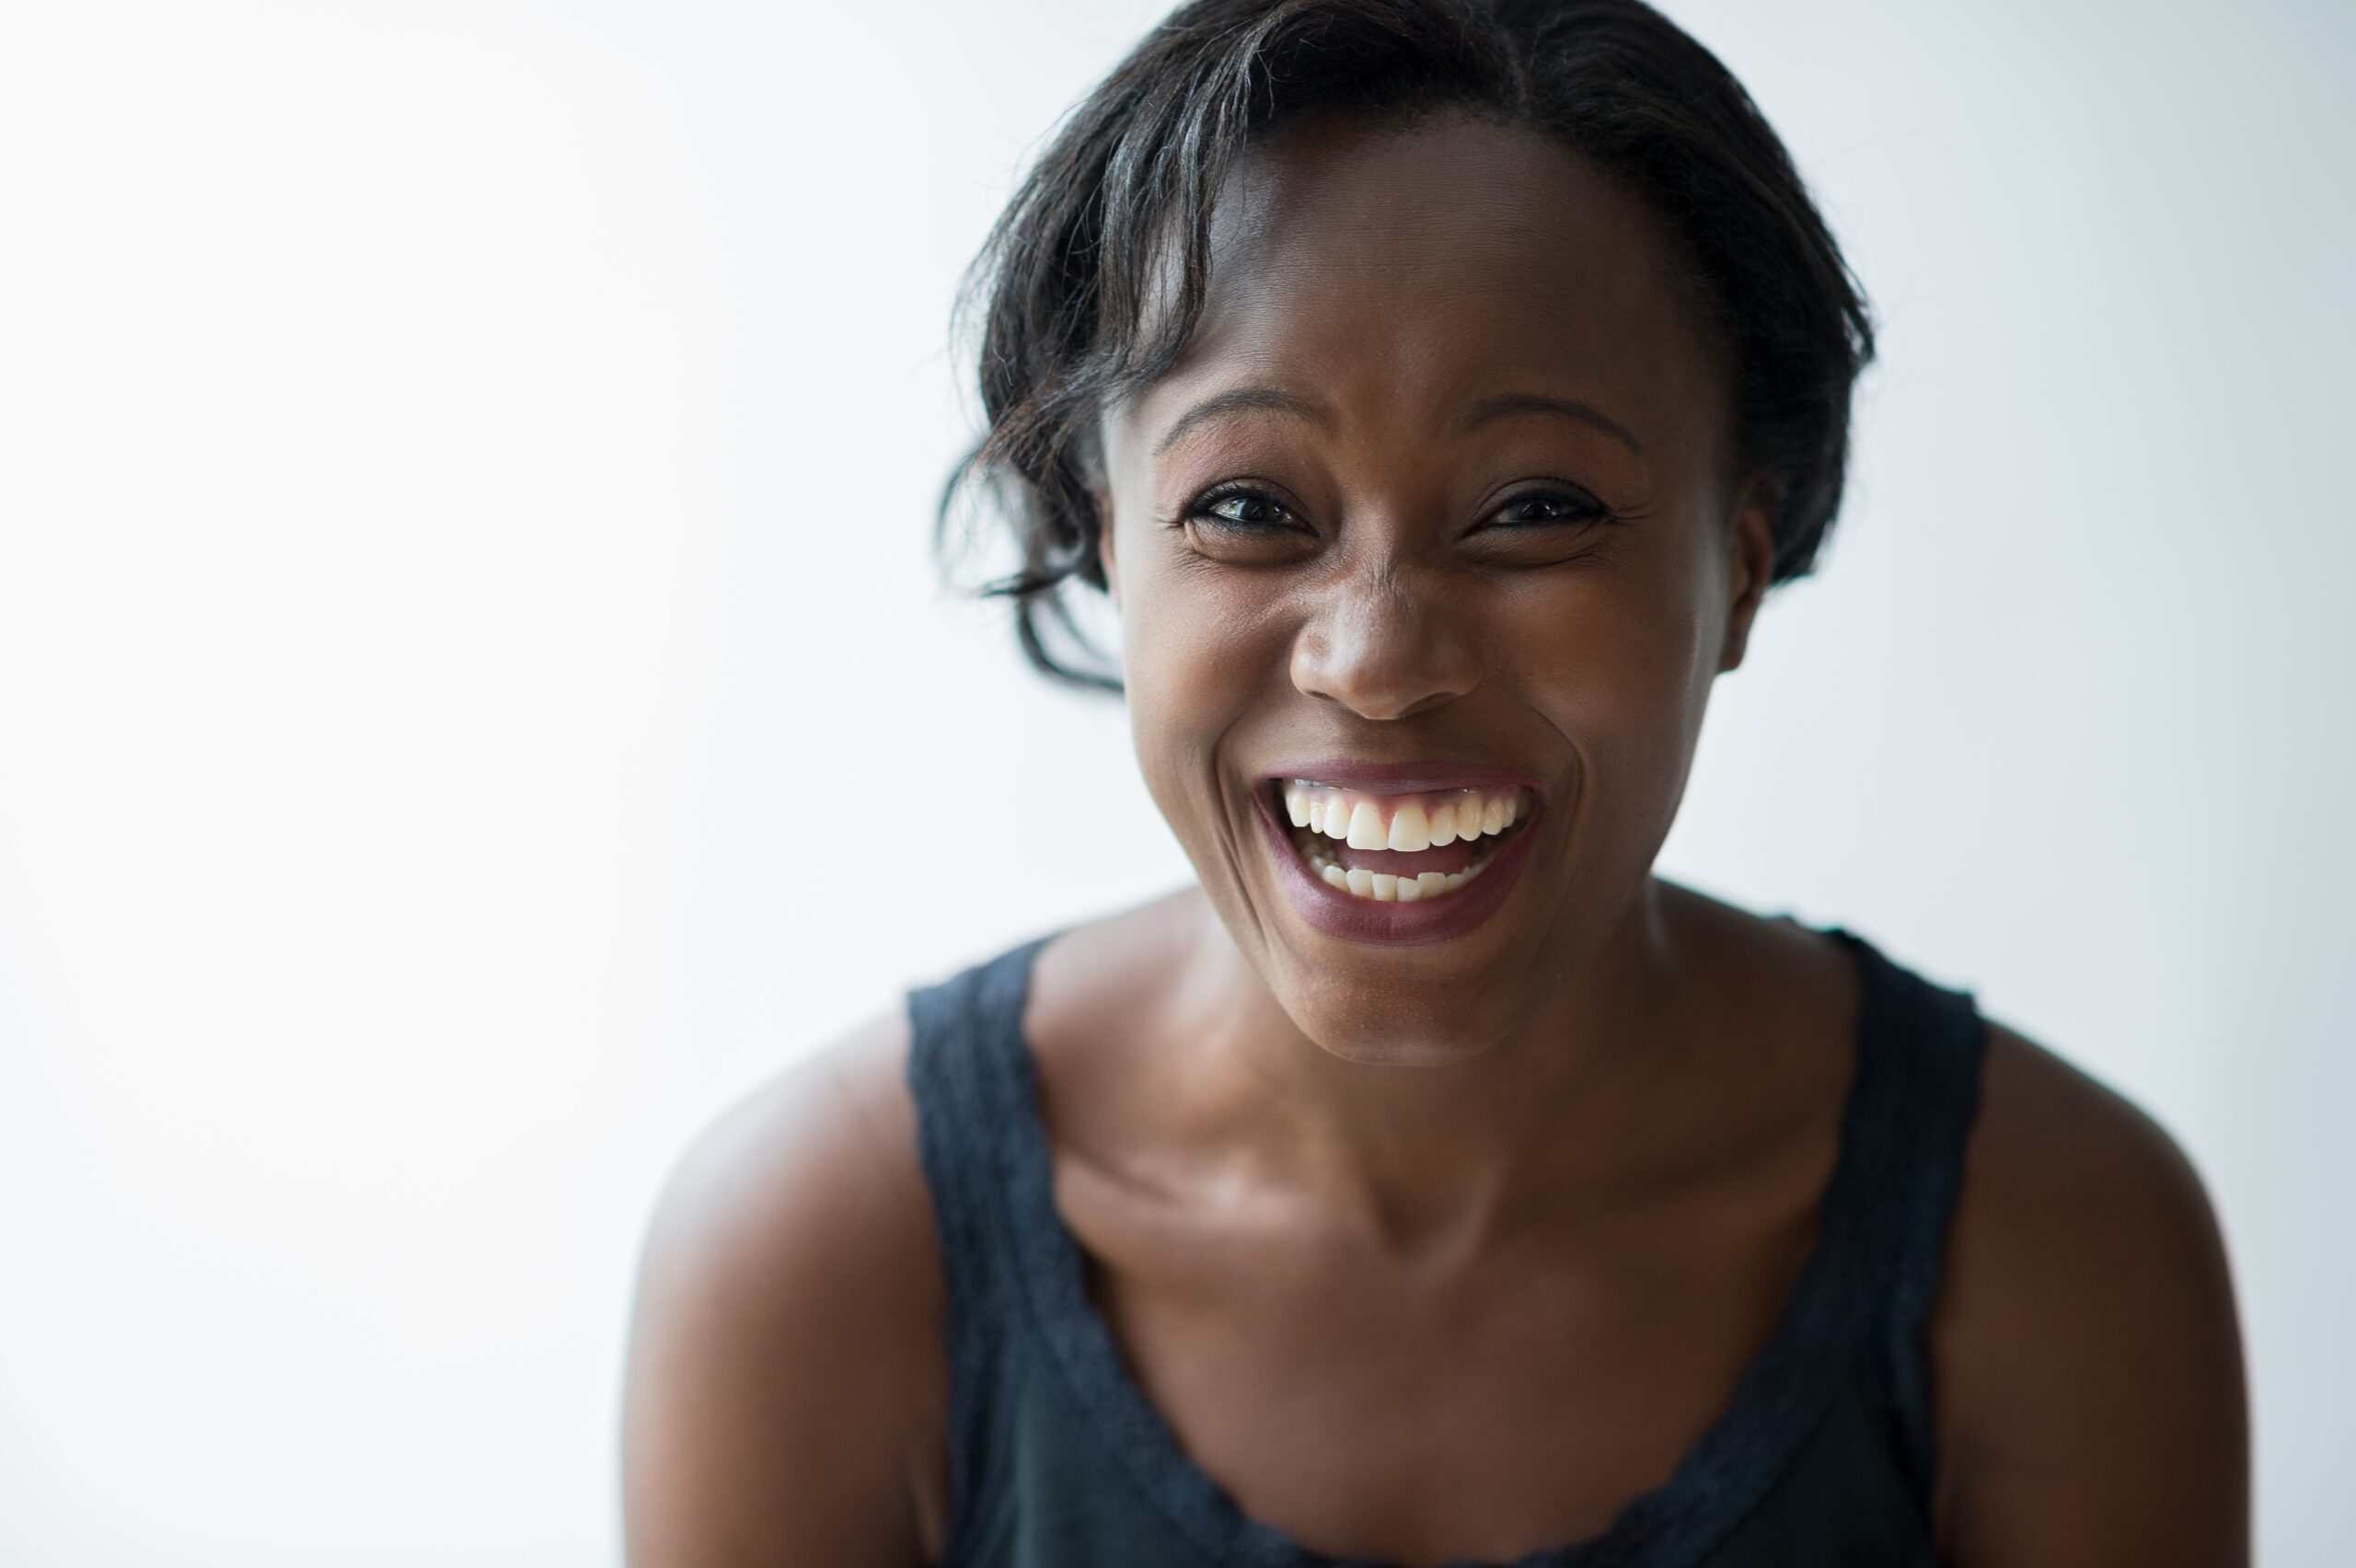 We Love Making You Smile | Dentist in Hawarden